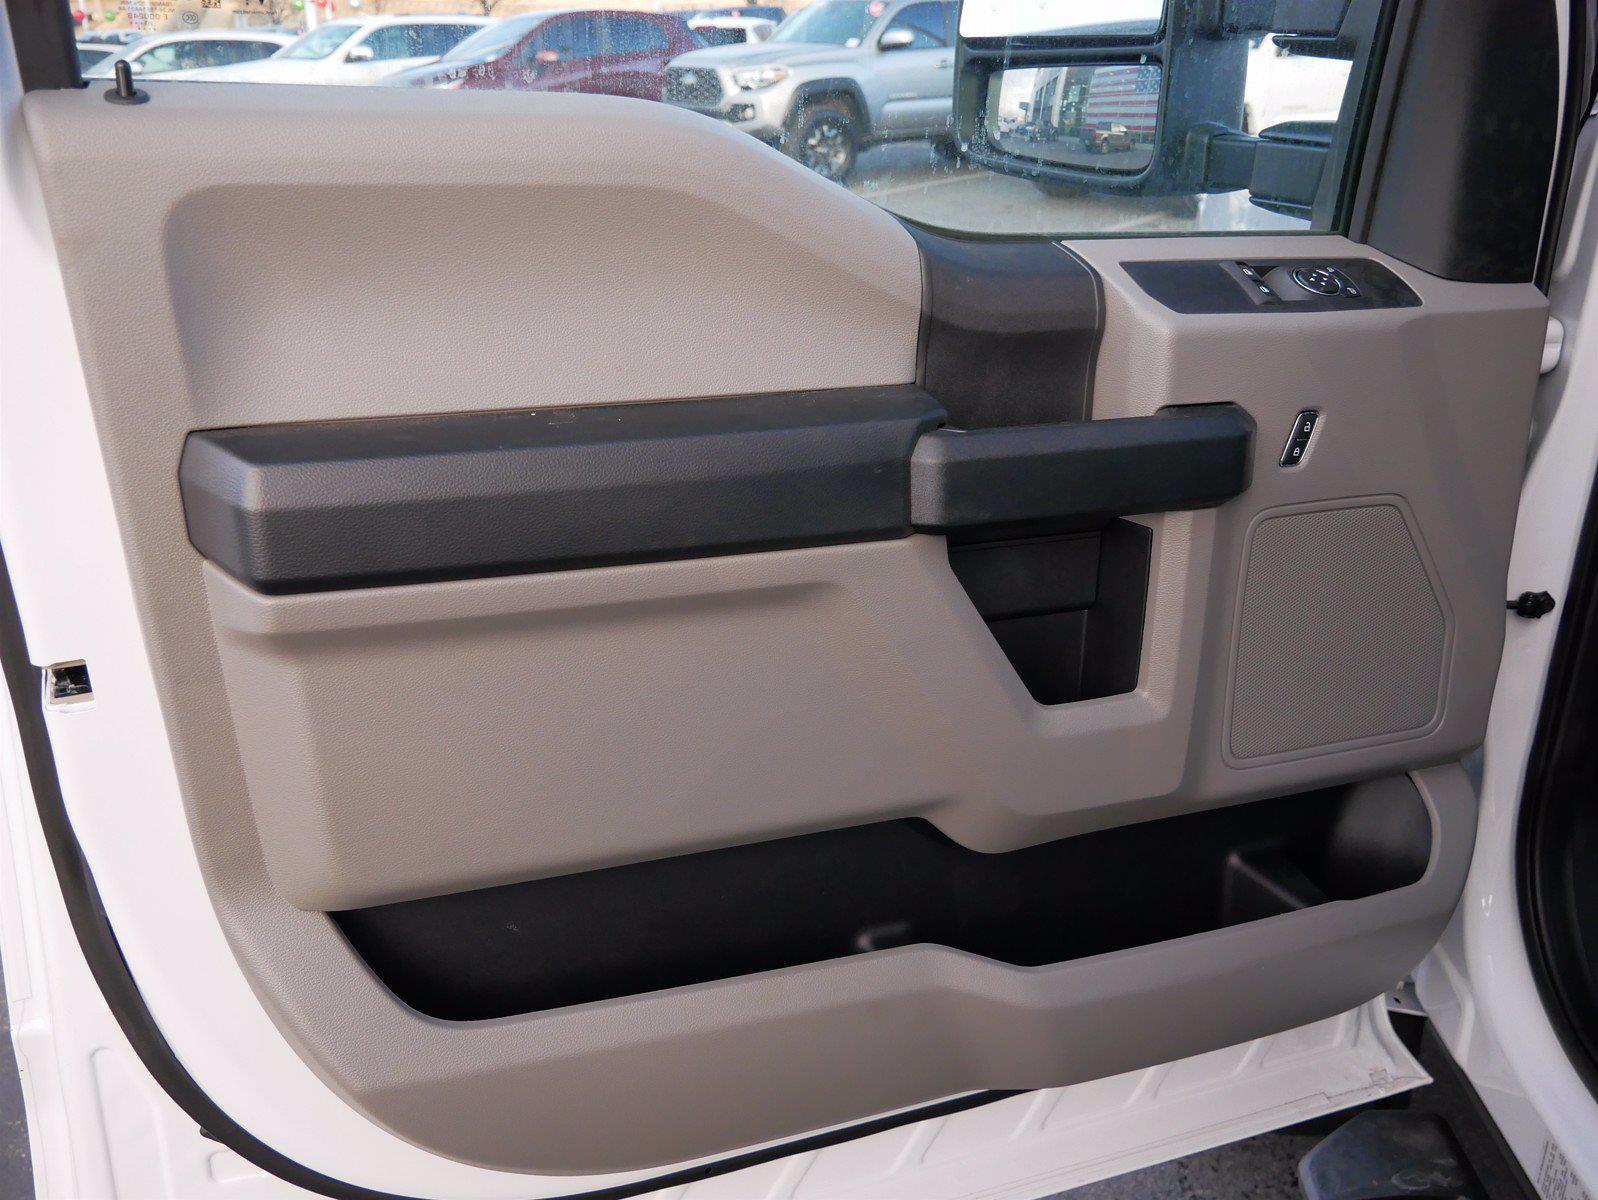 2021 Ford F-550 Regular Cab DRW 4x4, Scelzi Dump Body #64096 - photo 11